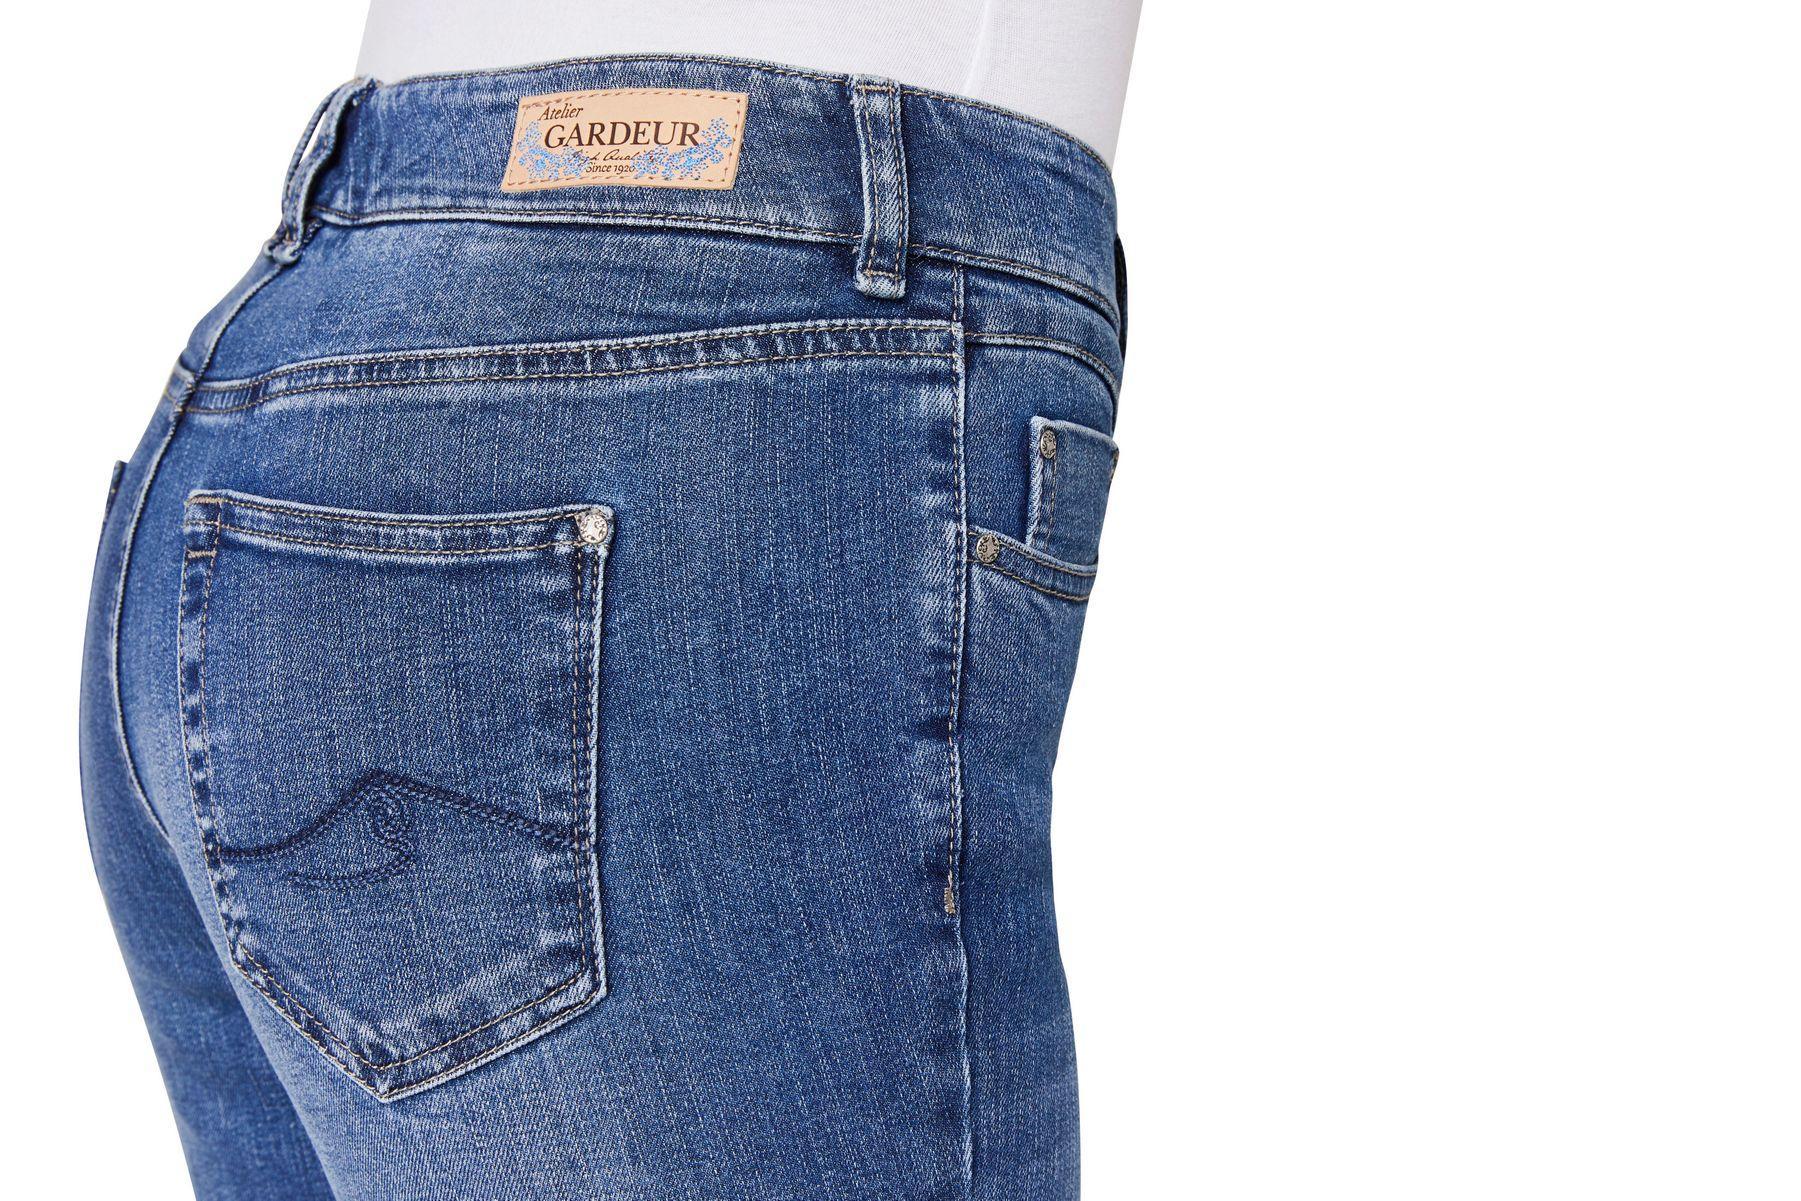 Atelier Gardeur - Slim Fit - Damen 5-Pocket Jeans Röhrenhose Zuri90 (670401) – Bild 3